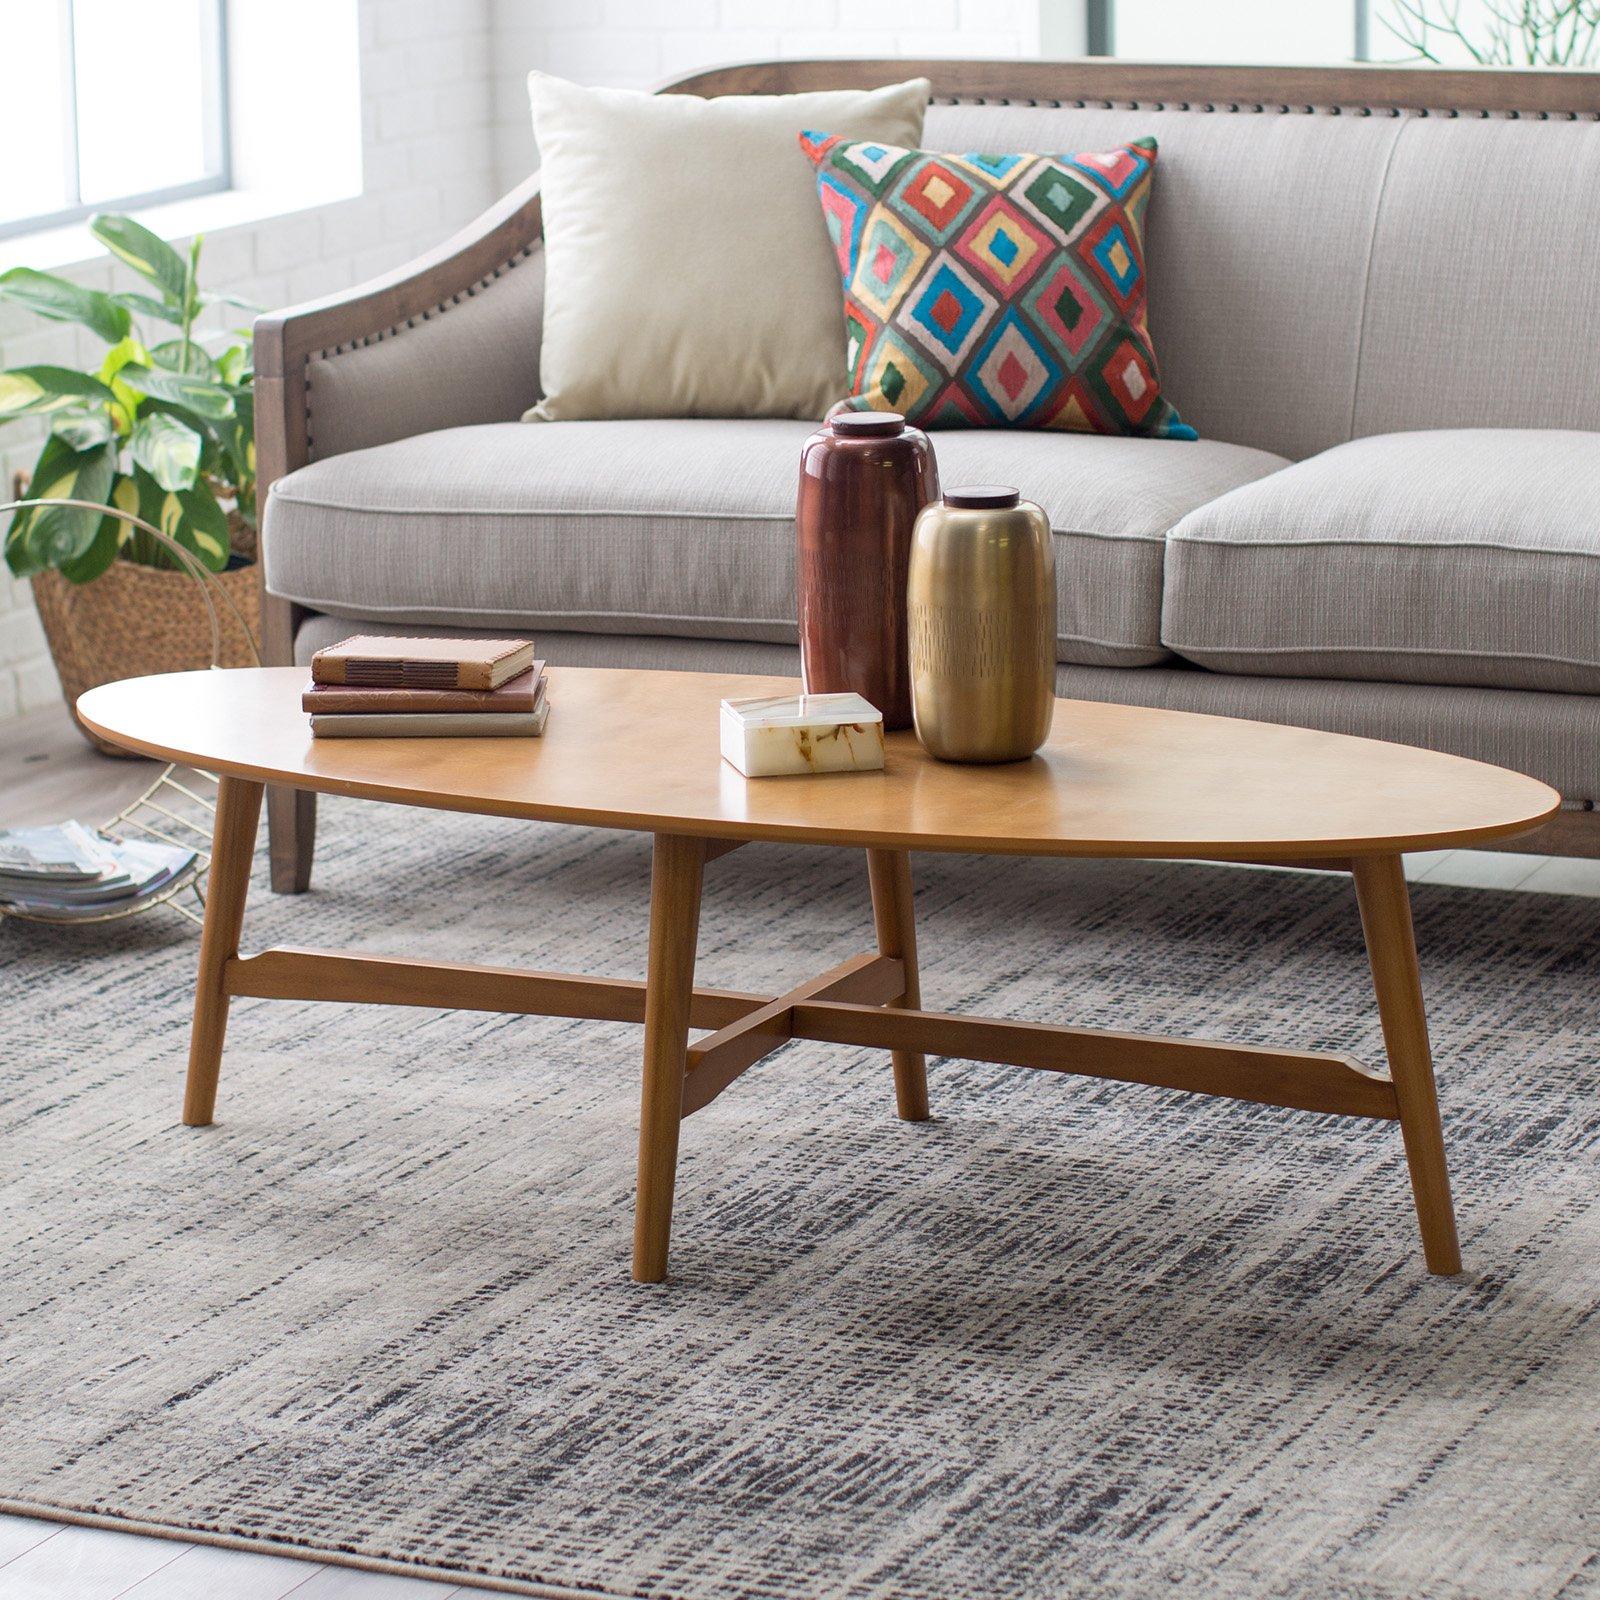 Belham Hayneedle Mid Century Modern Living Room Furniture Living Room Coffee Table Mid Century Modern Coffee Table [ 1600 x 1600 Pixel ]